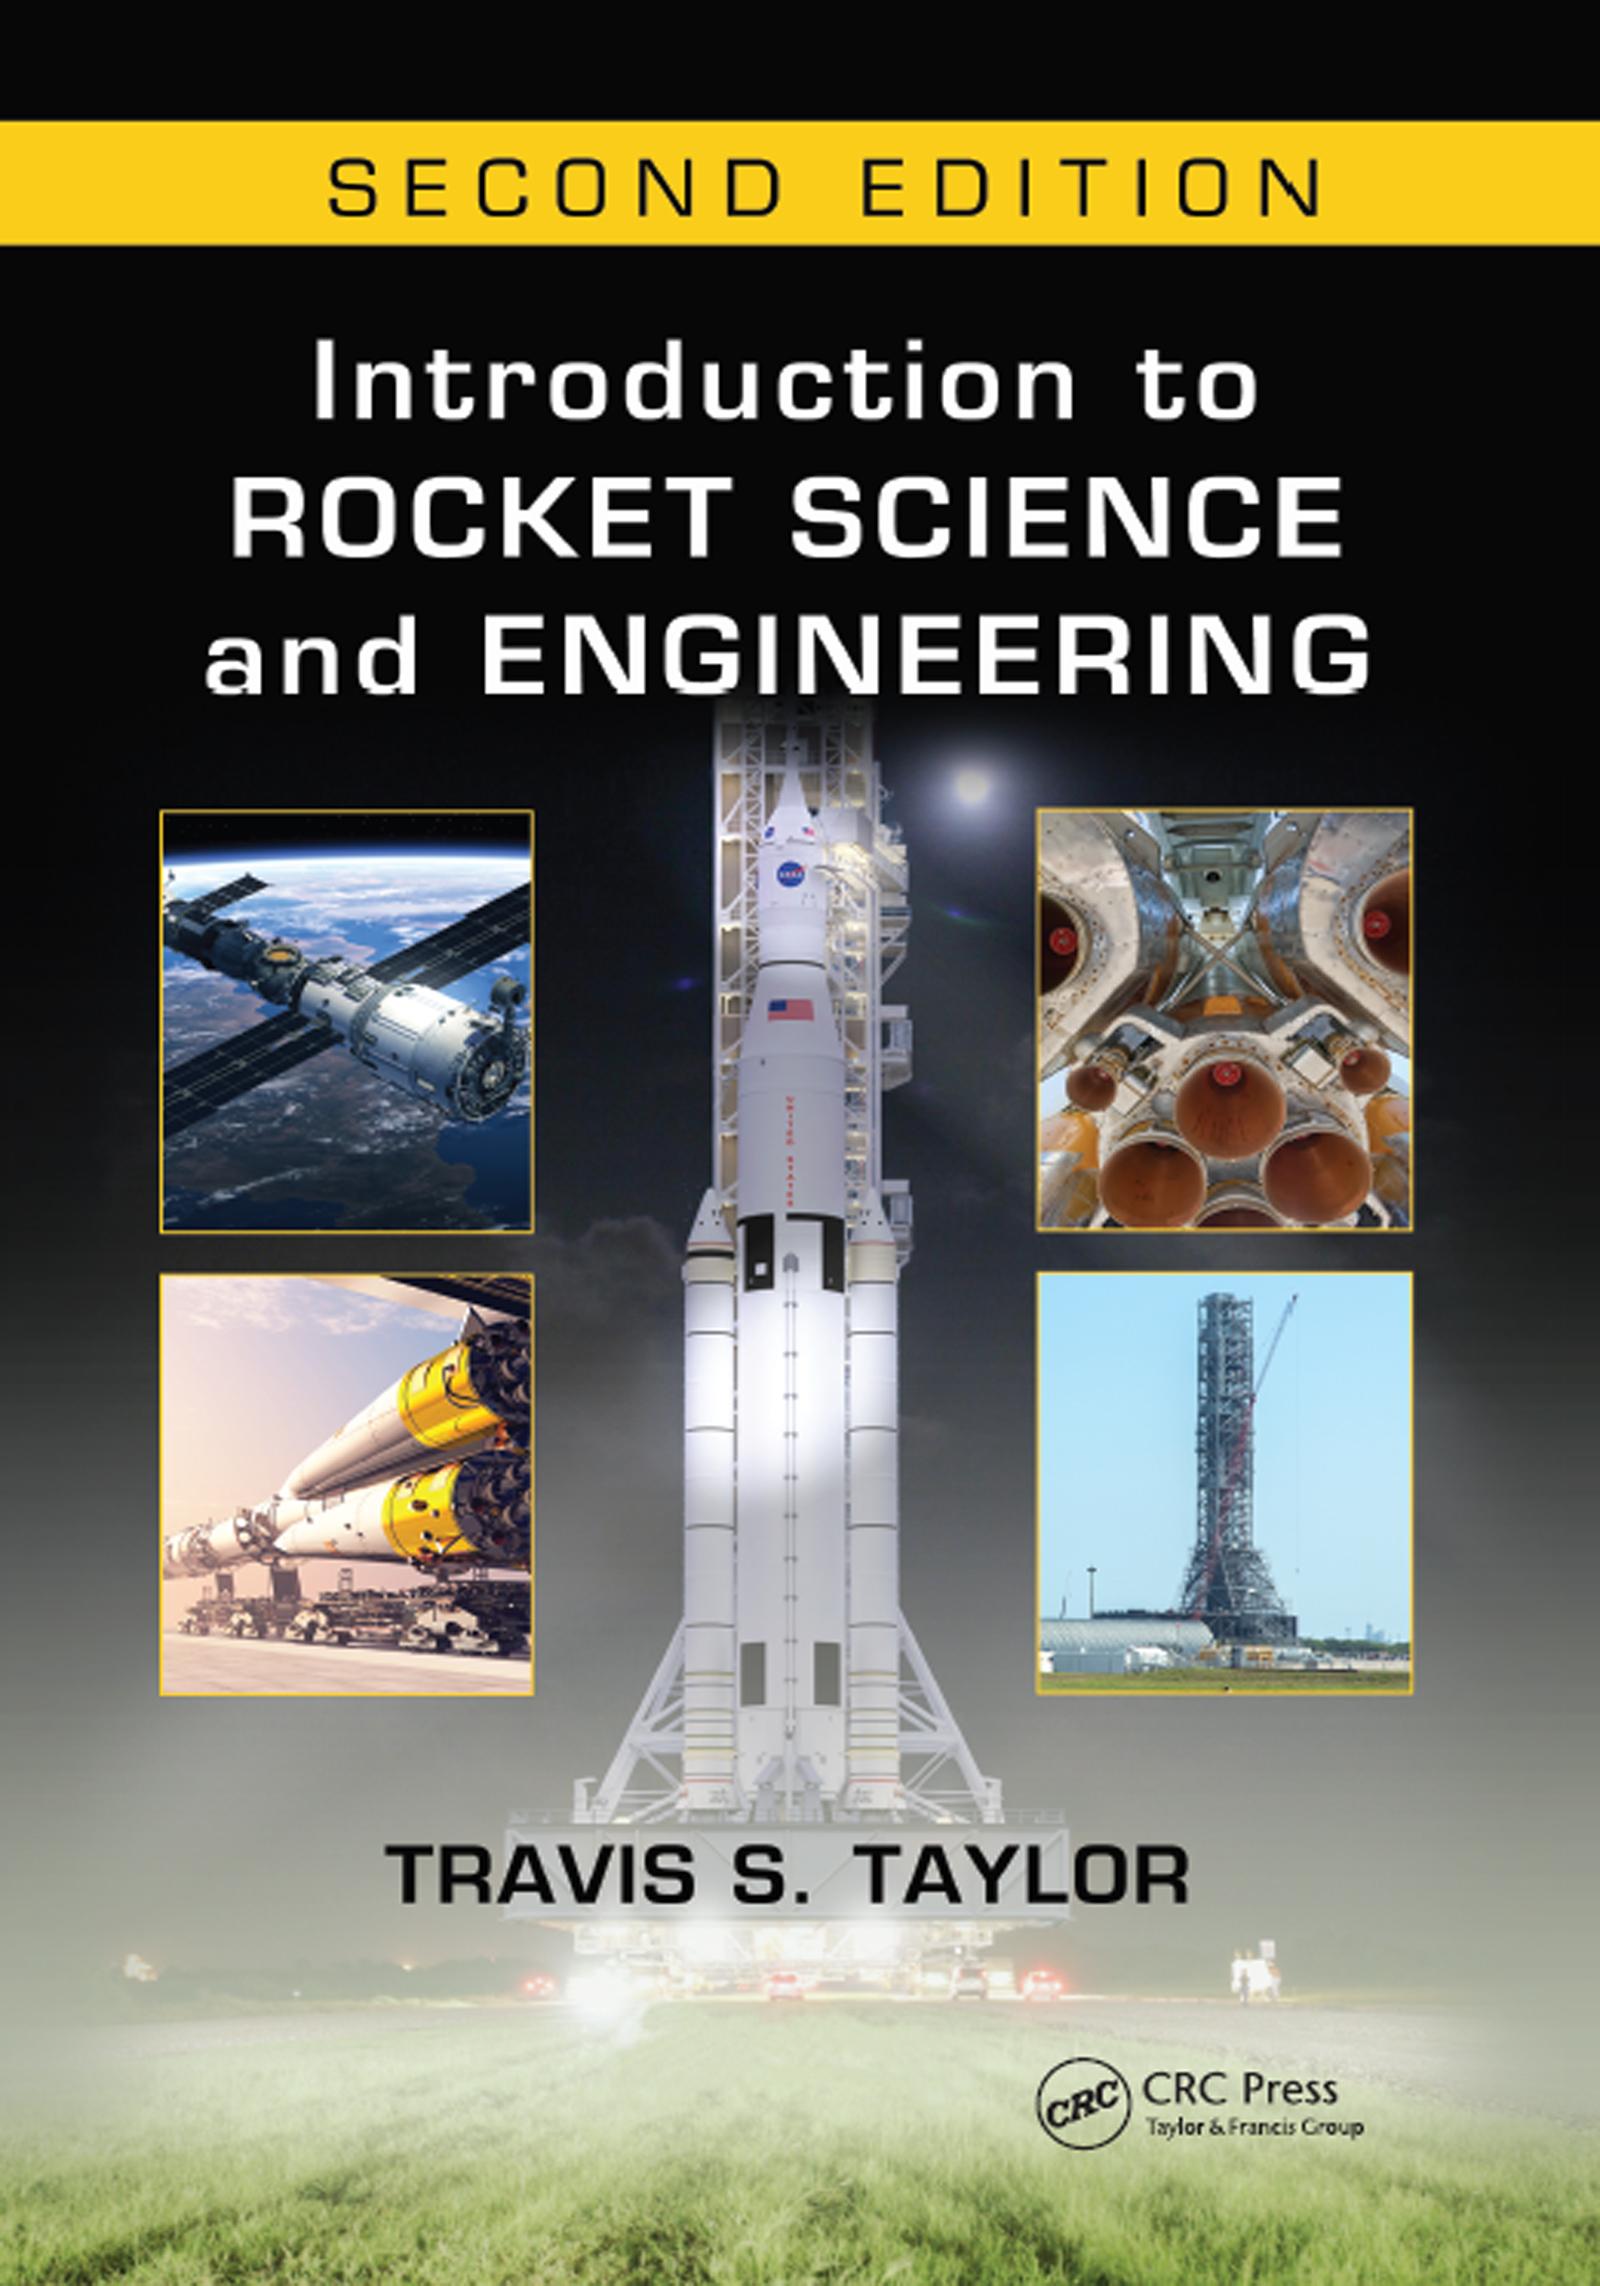 How Do We Test Rockets?